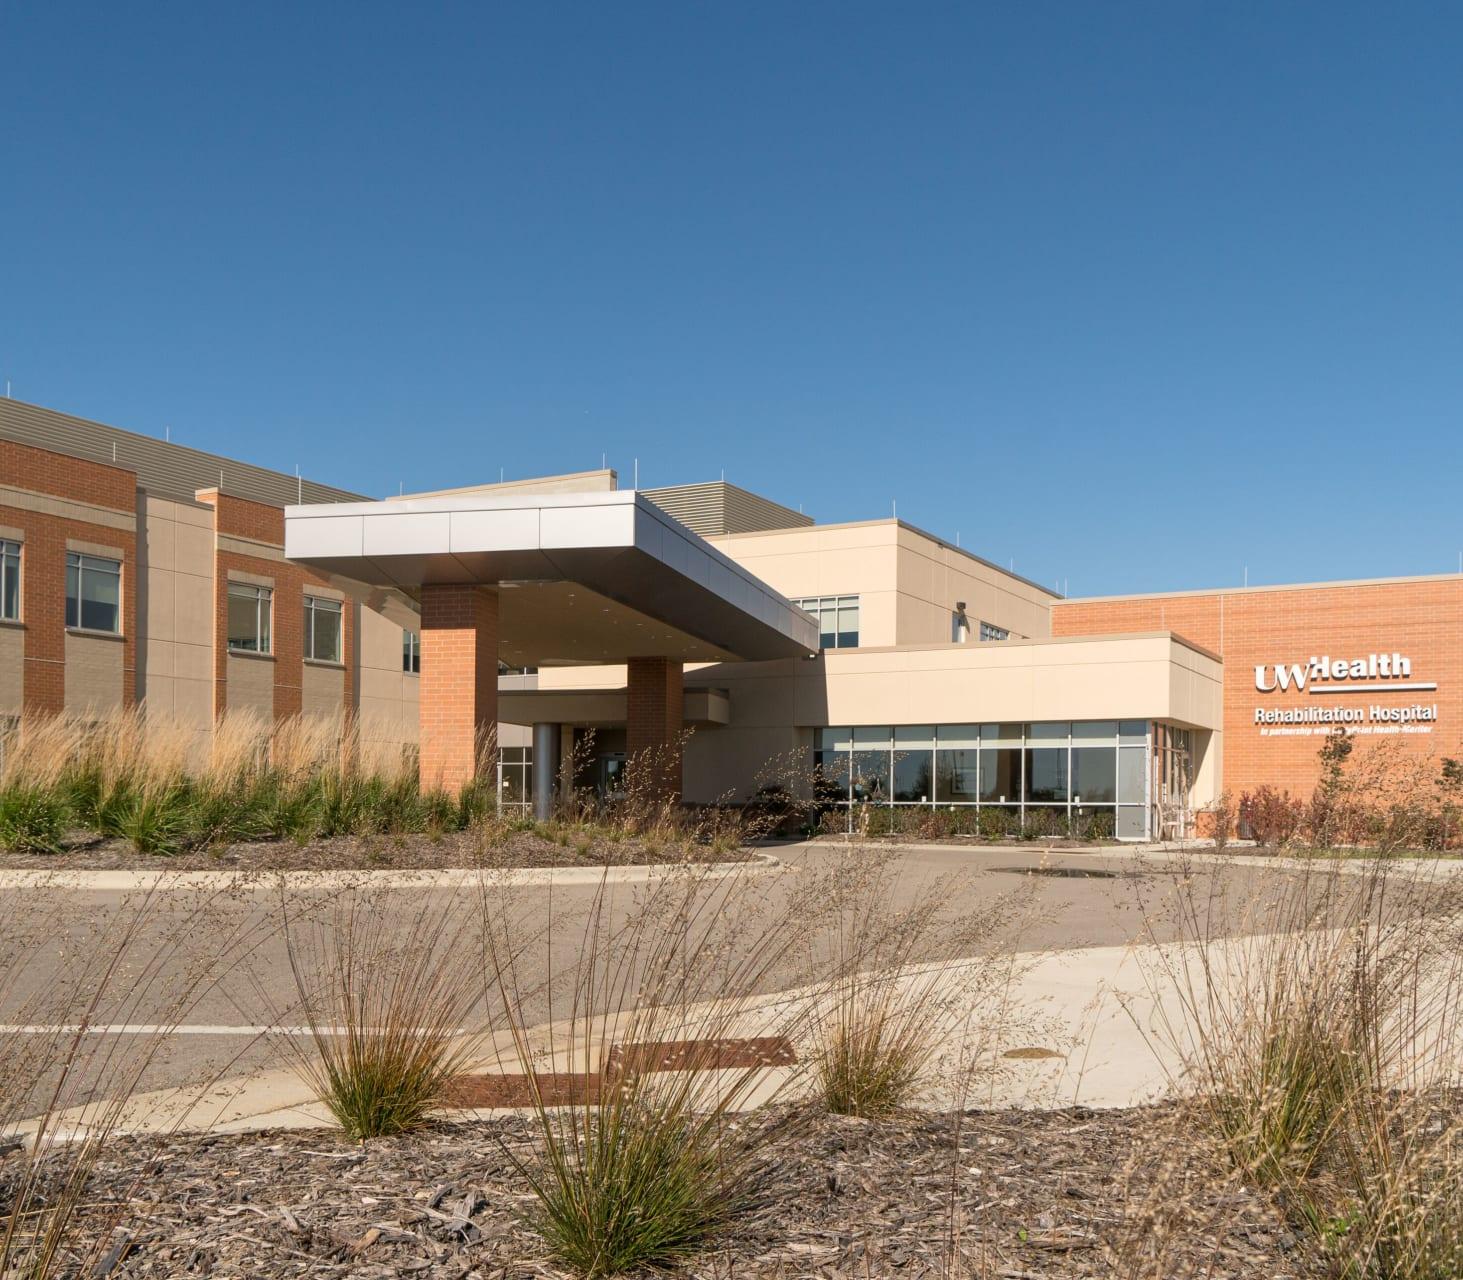 UW Health Rehabilitation Hospital Facility Image